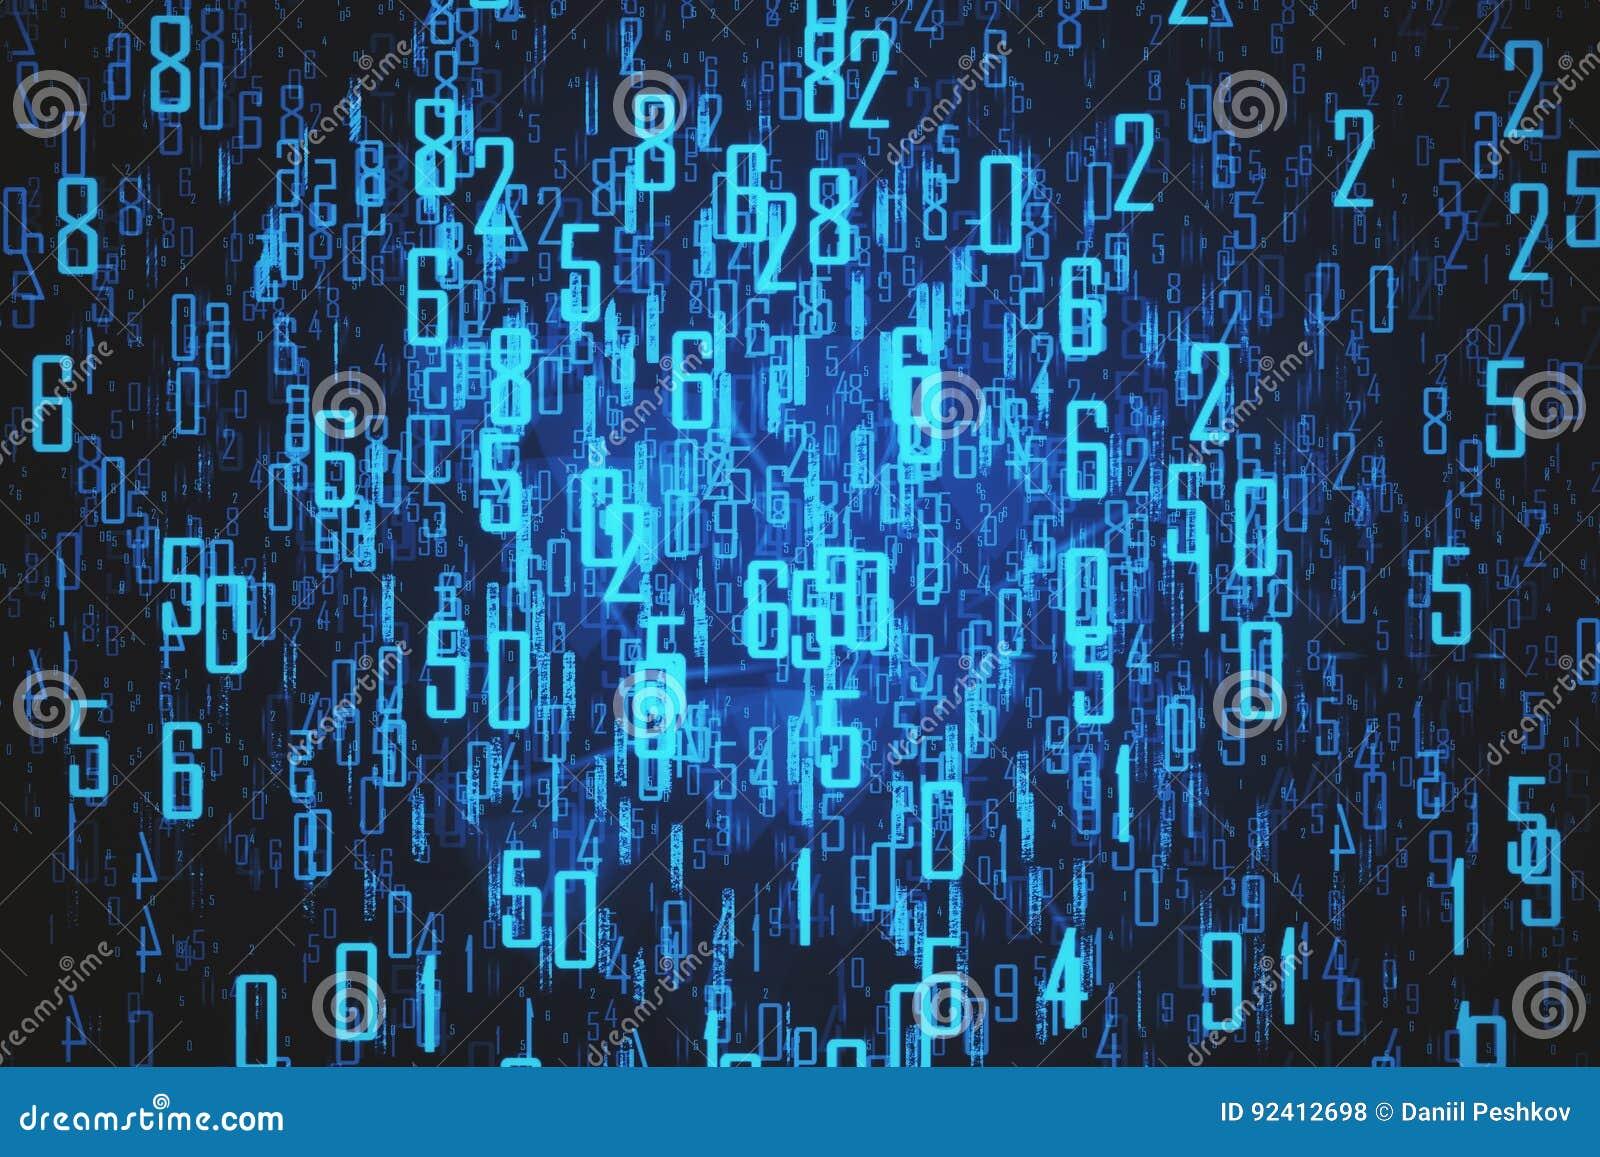 Contexto azul com dígitos